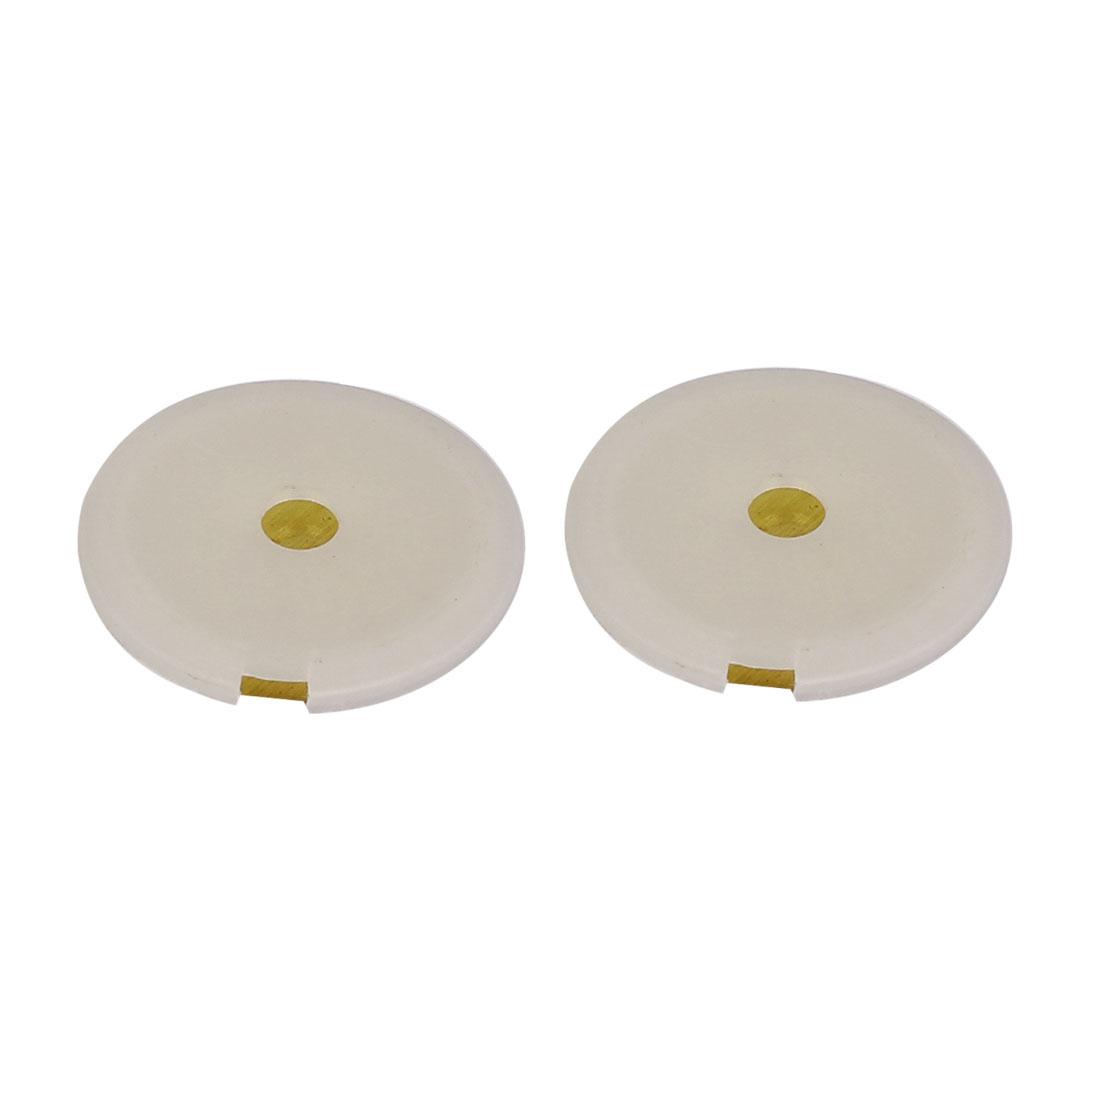 2PCS 27mm Piezo Disc w Plastic Shell for Buzzer Sensor Trigger DIY Speaker